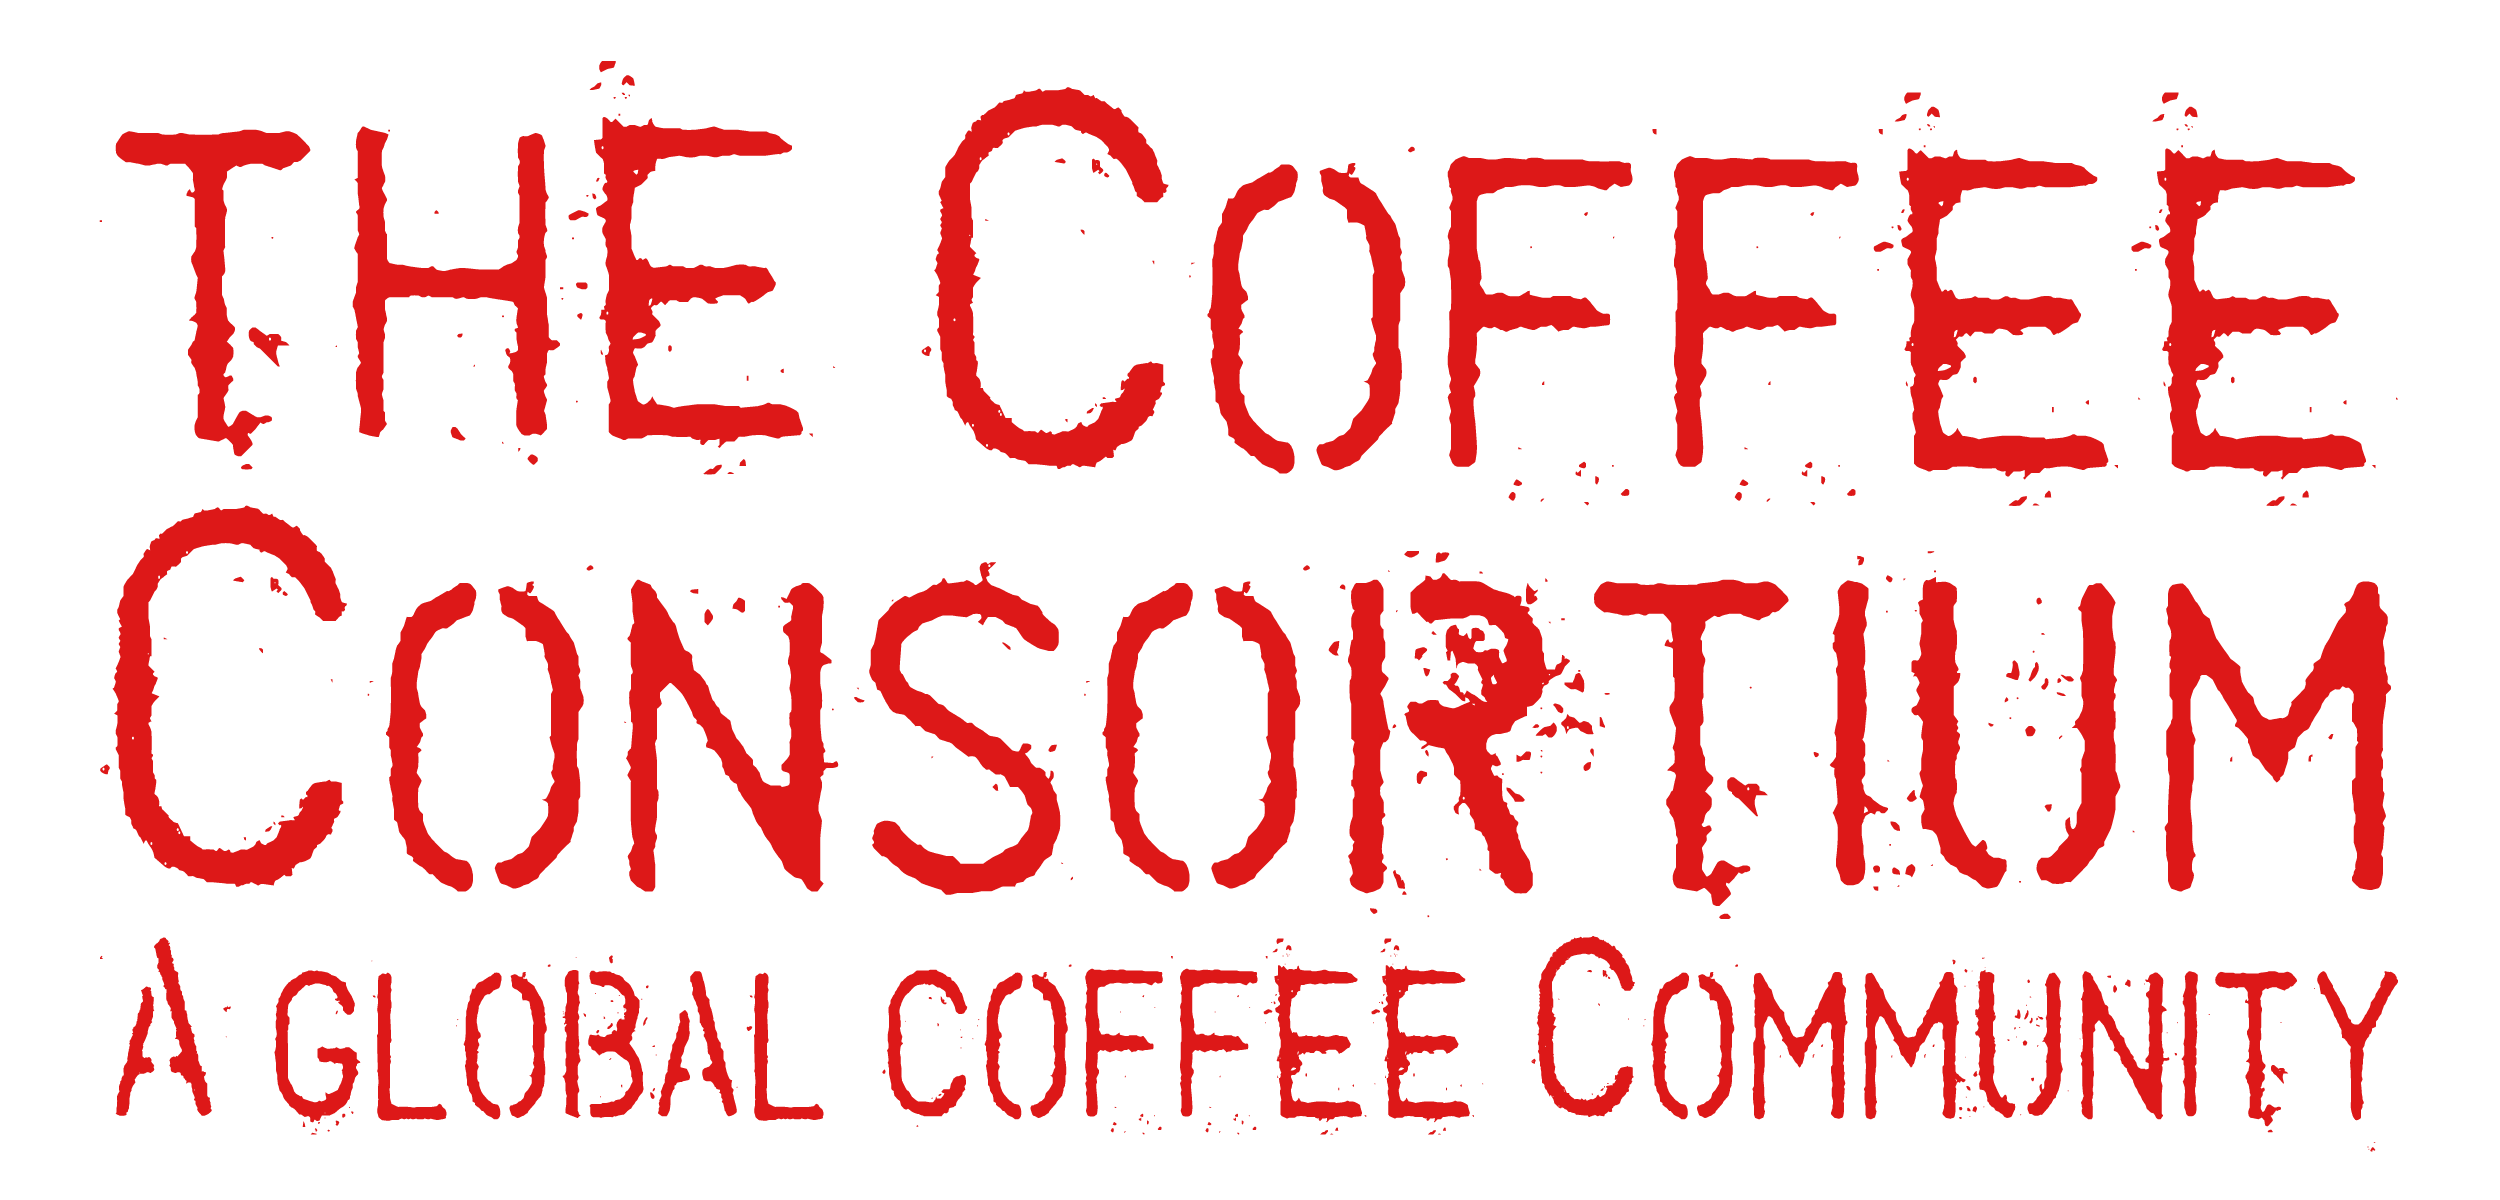 A Global Coffee Community